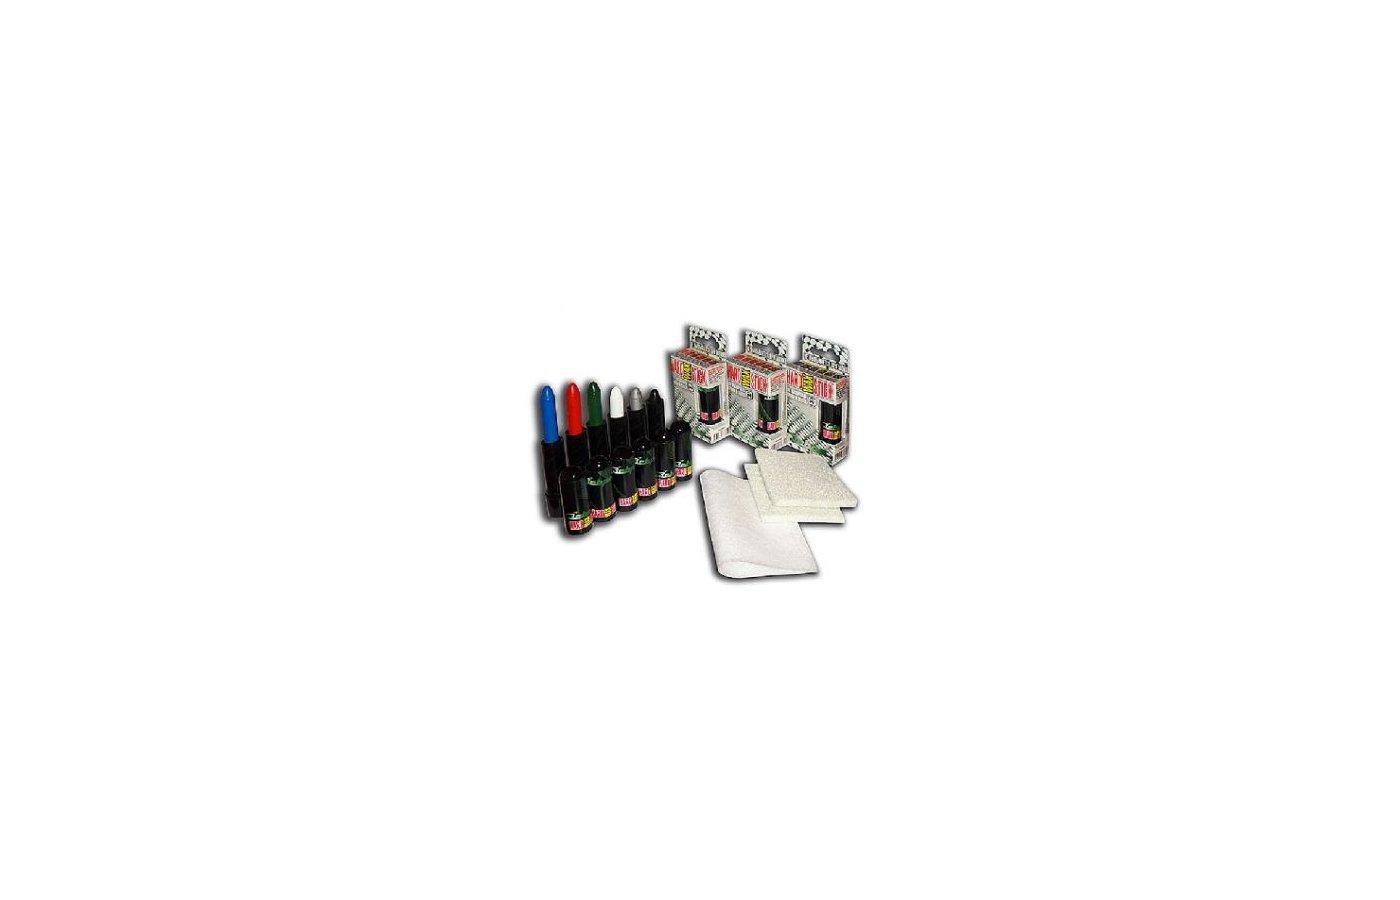 Корректор ЗЕБРА ТМ 1327 HardWAX Stick Восковой карандаш серый(серебро)